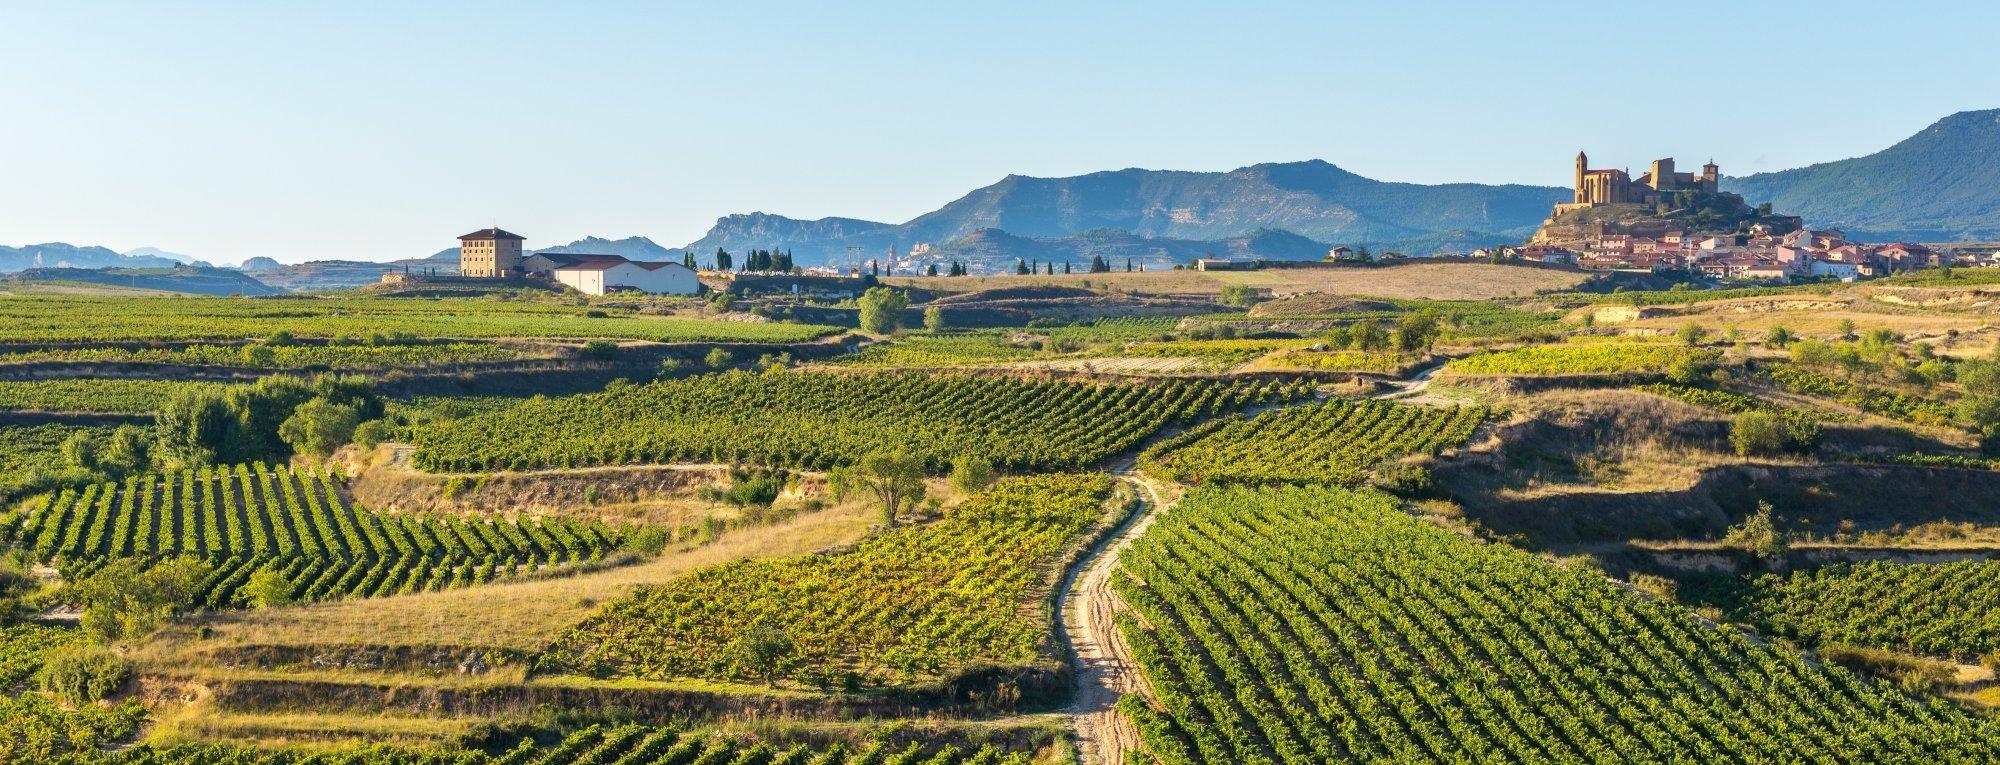 Why consider vineyards for sale in Spain? - Eurobrix Blog